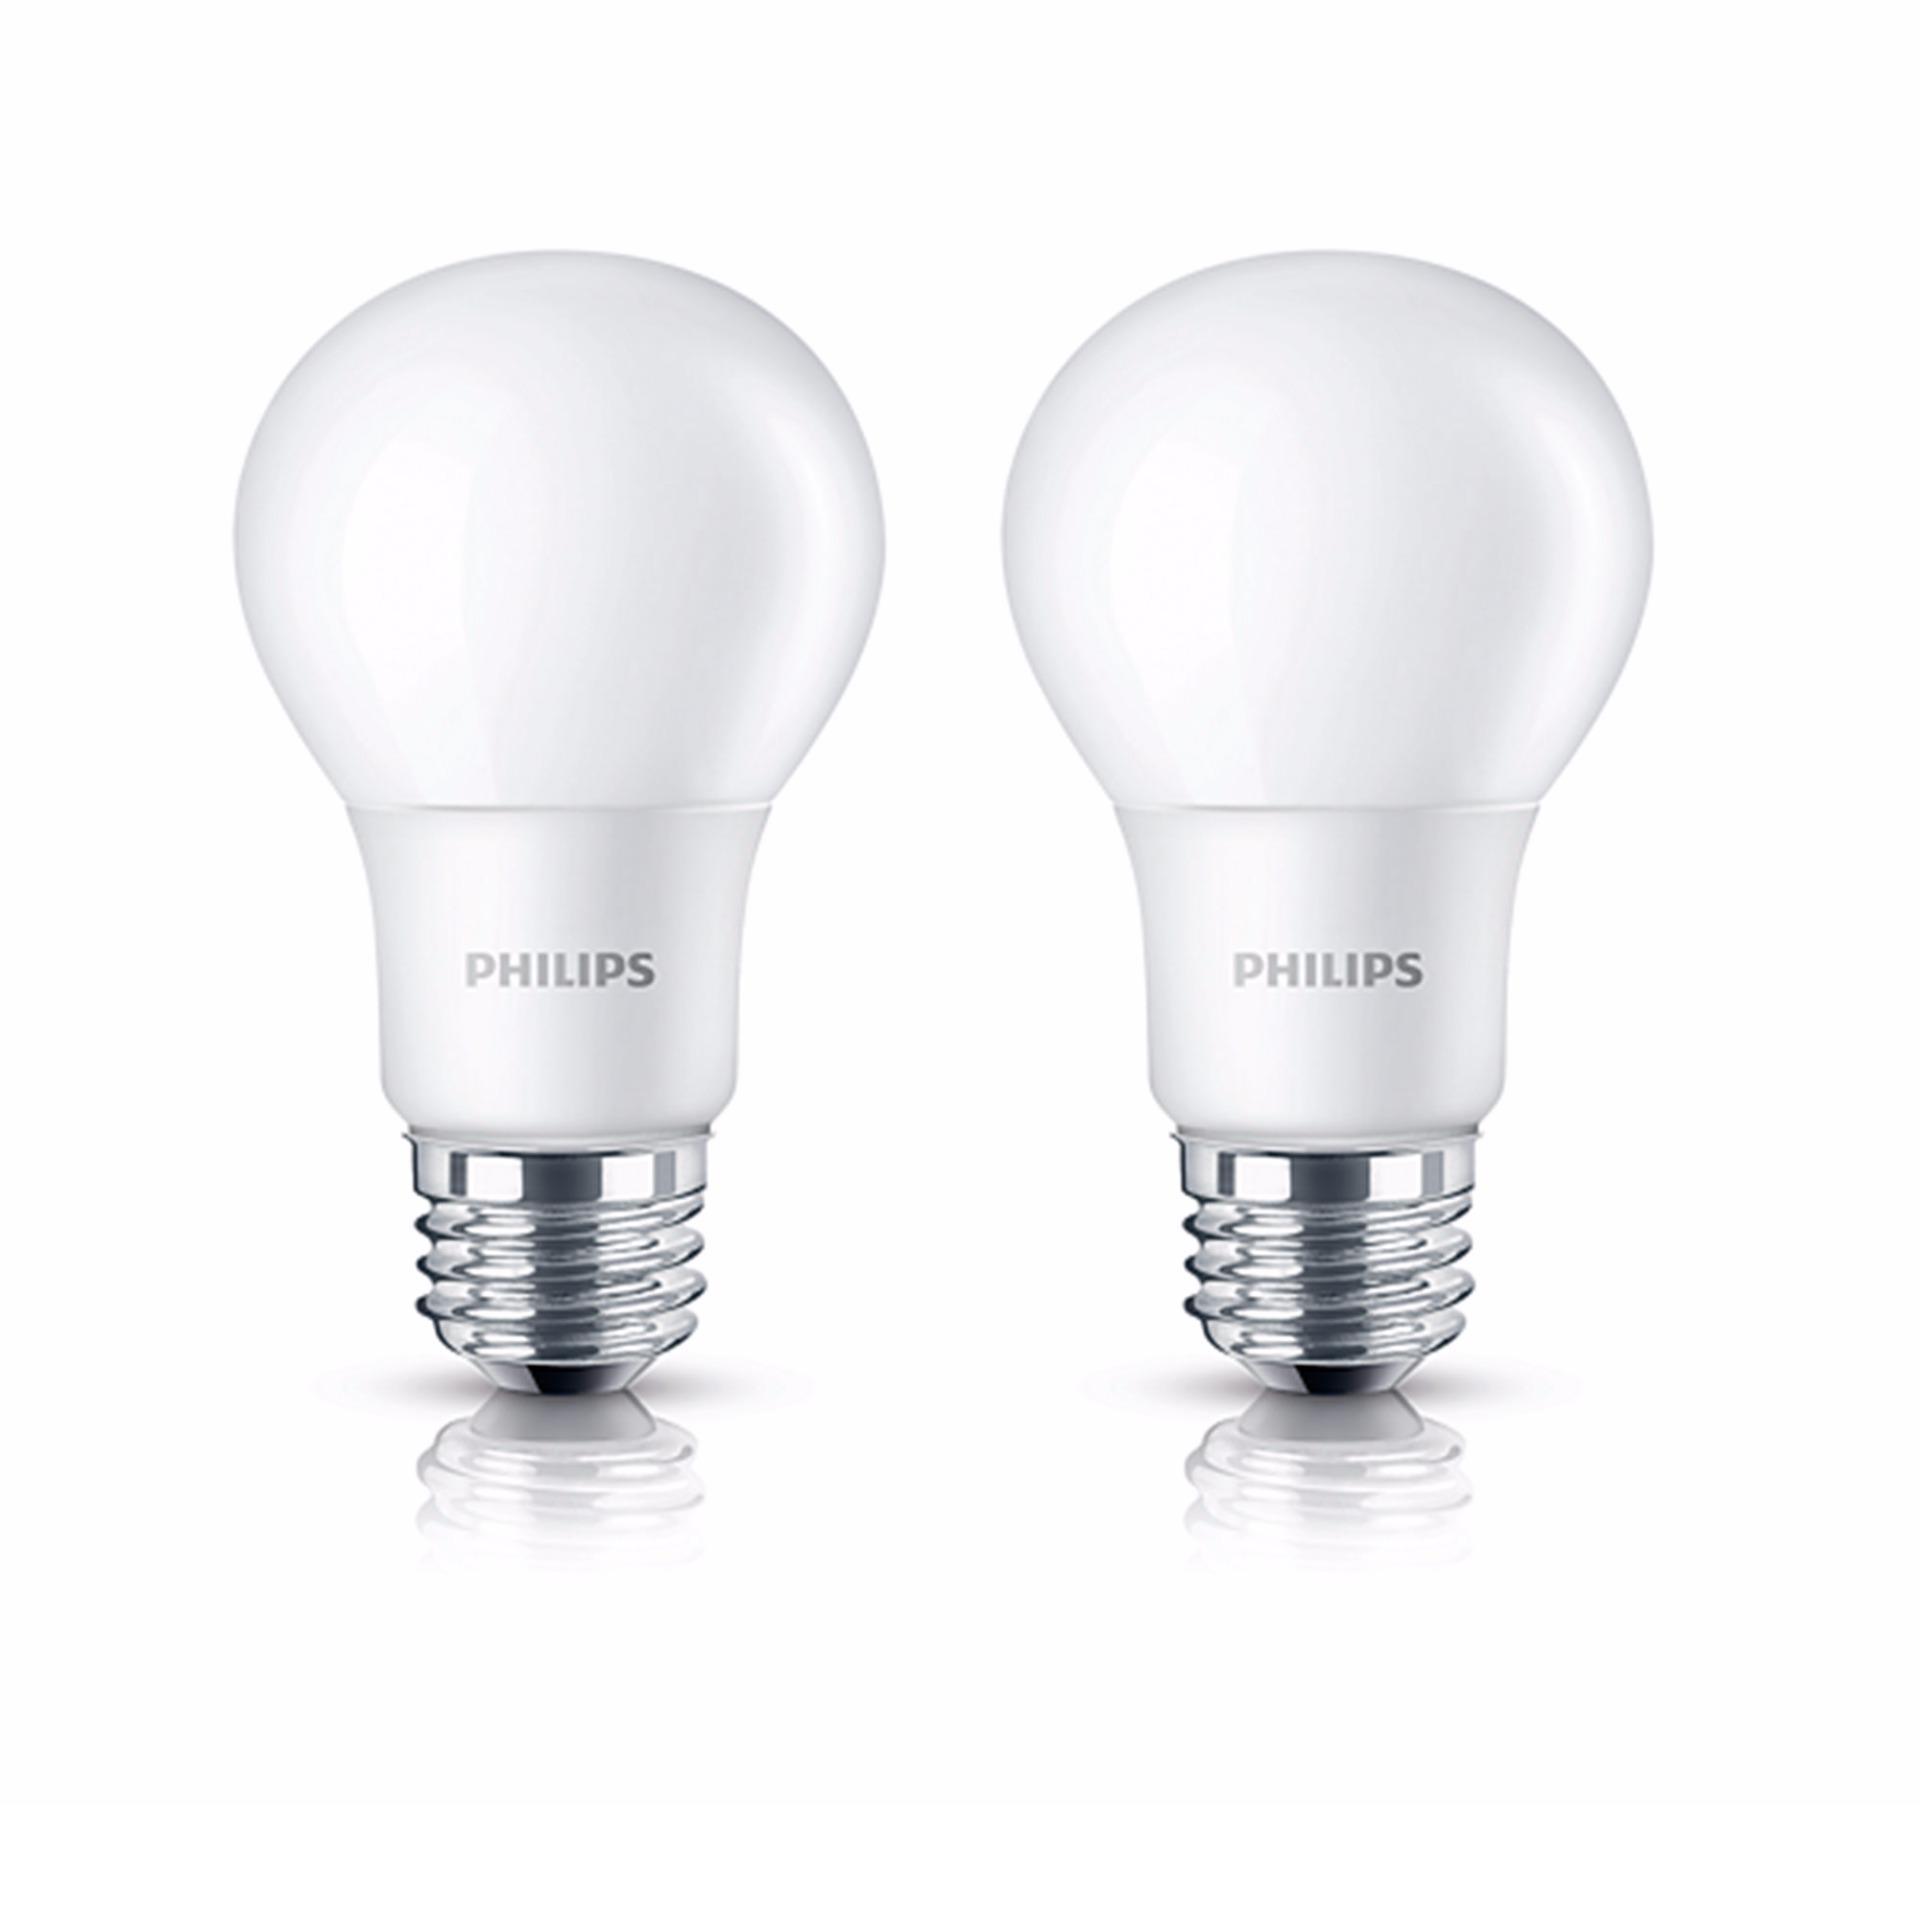 Philips Lampu LED Bulb 13 Watt E27 3000K 230V Kuning - 2 buah